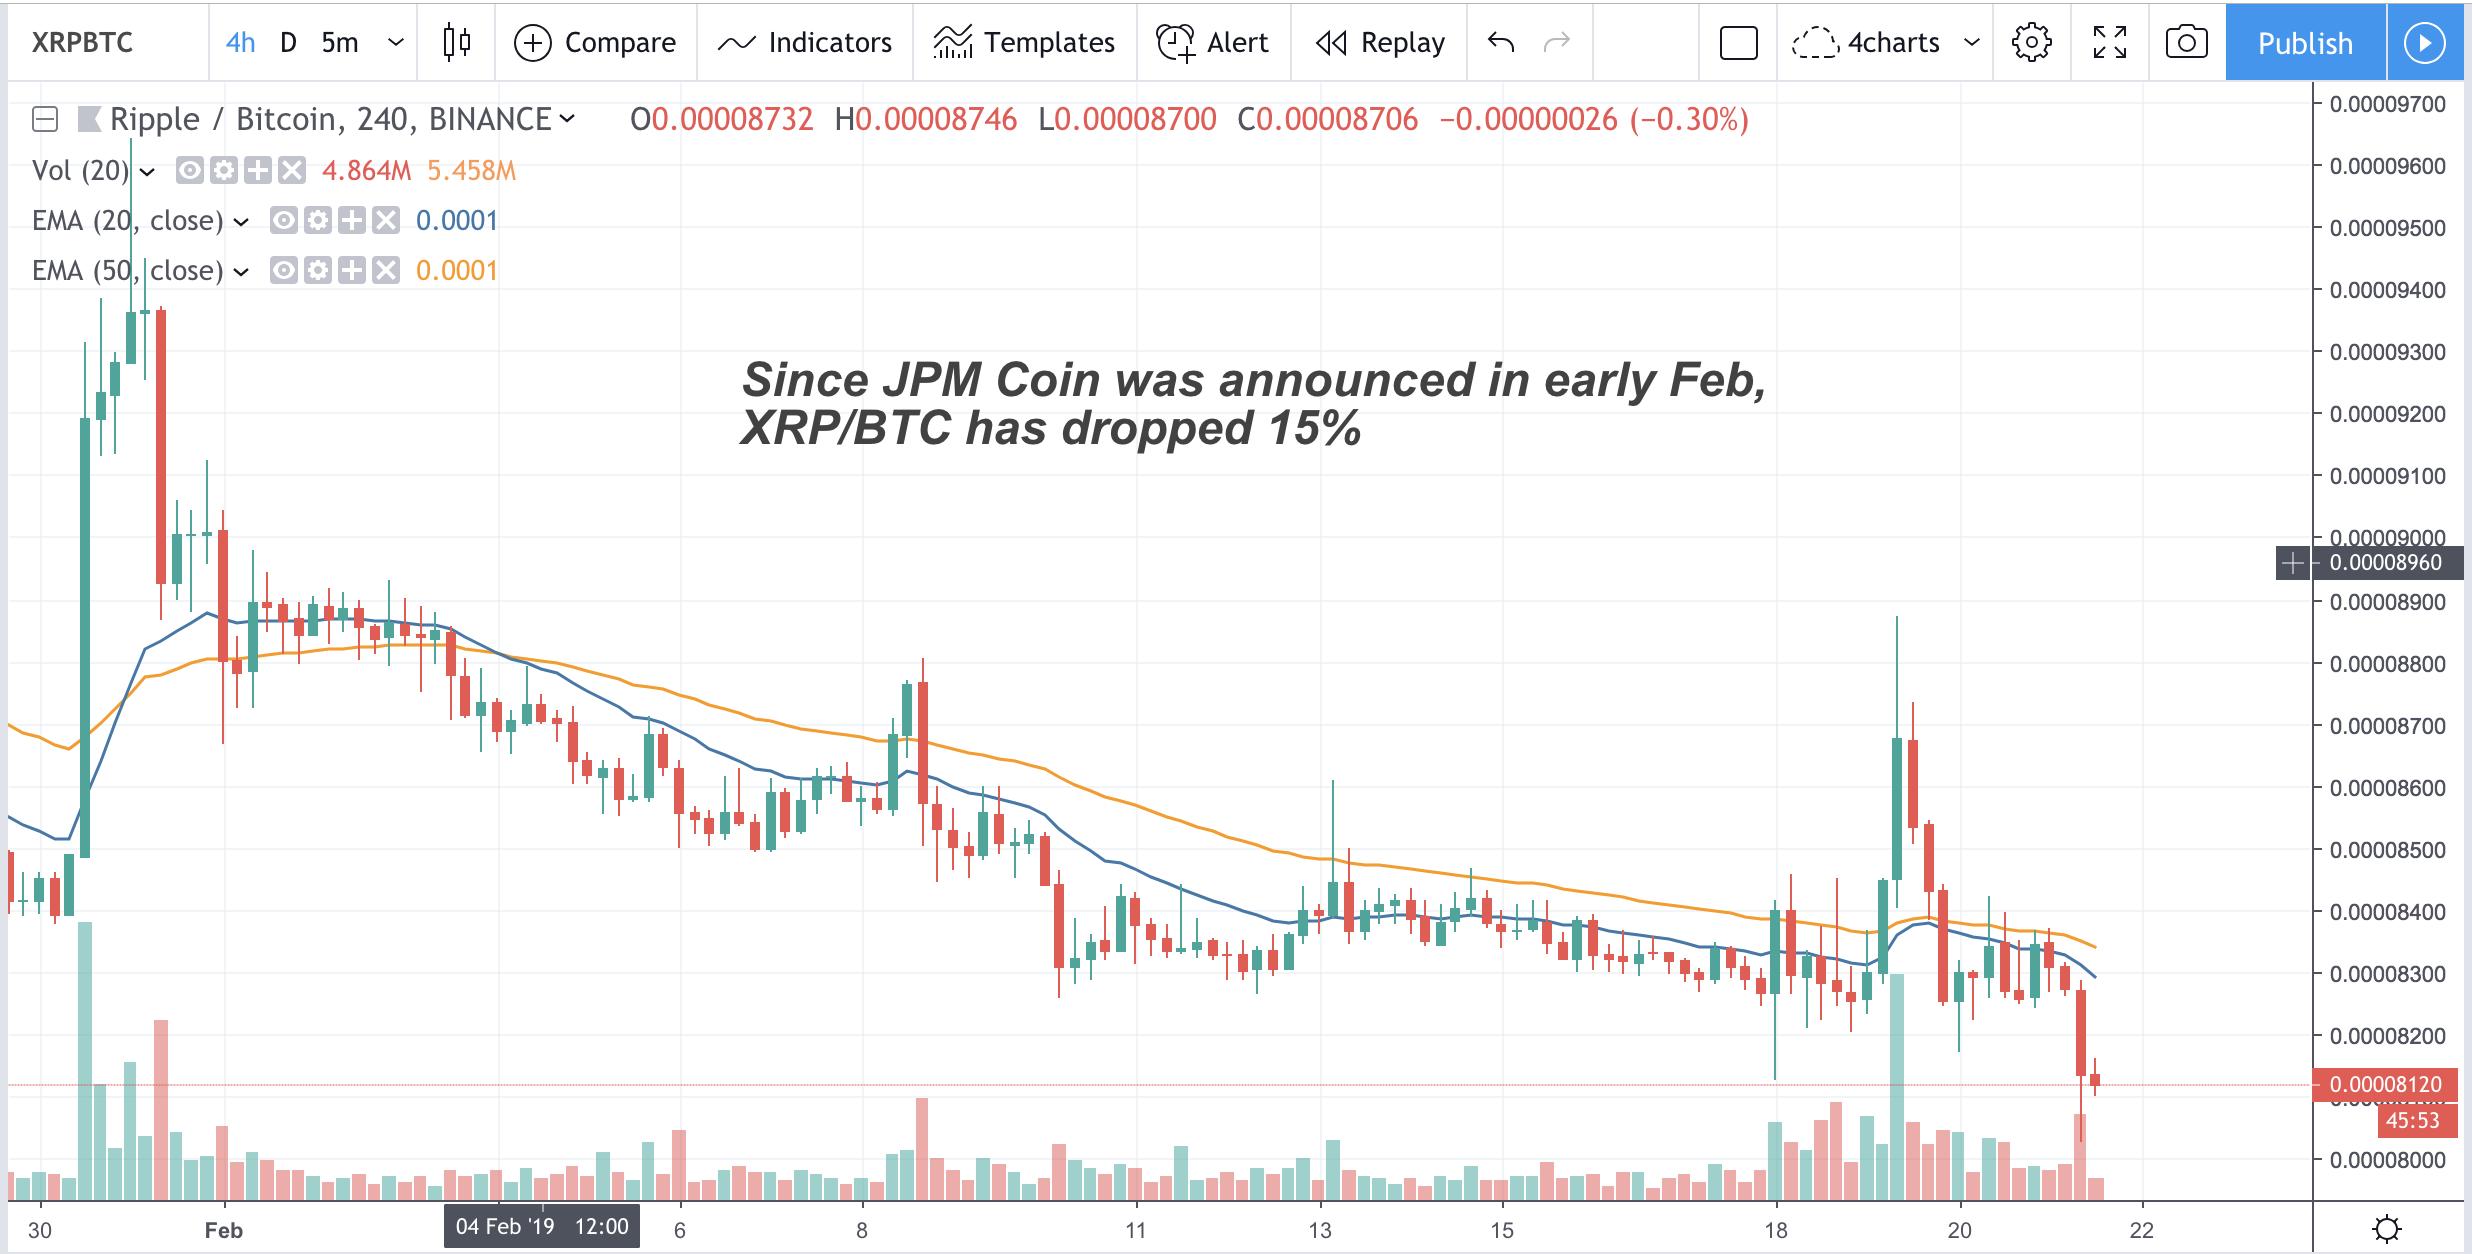 XRP-BTC drop since JPM Coin